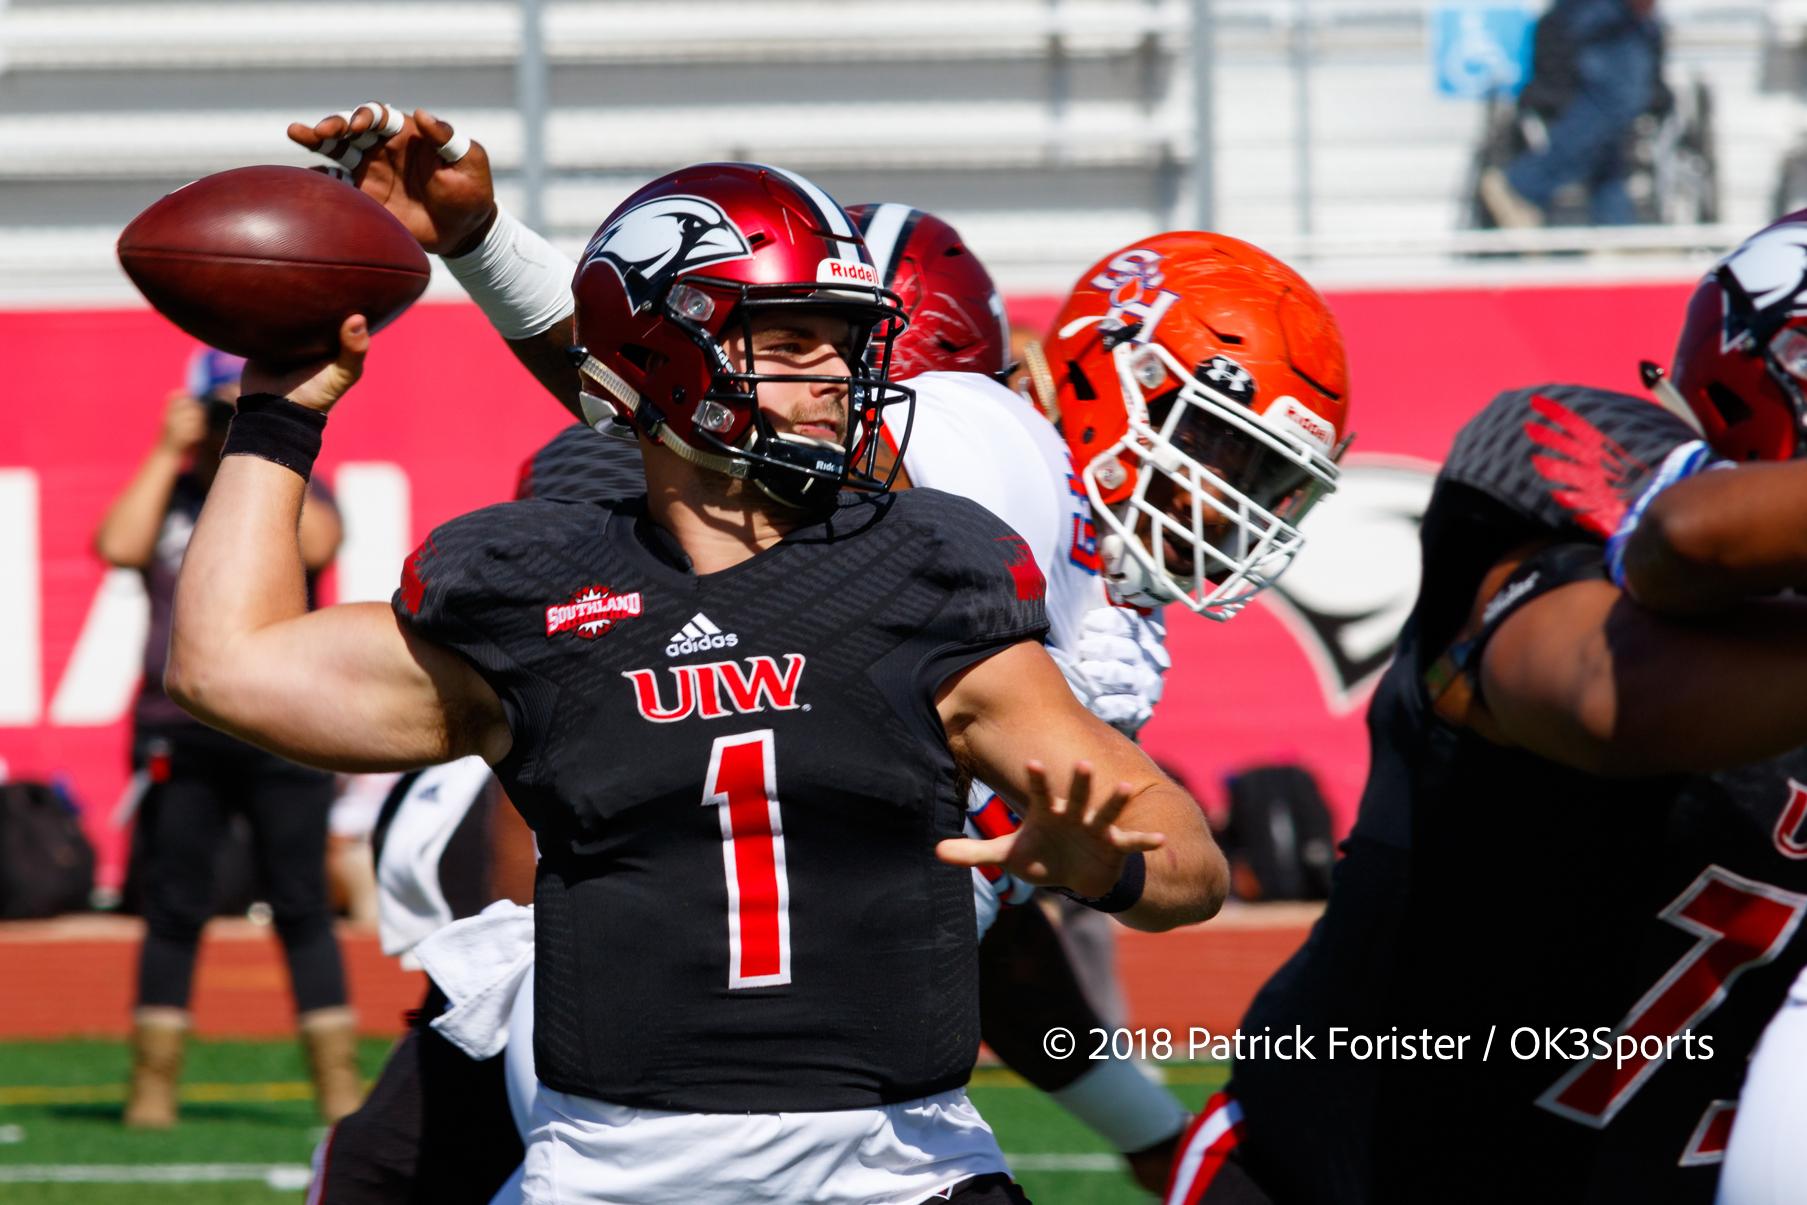 College Football Uiw 43 Sam Houston 26 Jon Copeland Passes Cardinals To Victory Ok3sports